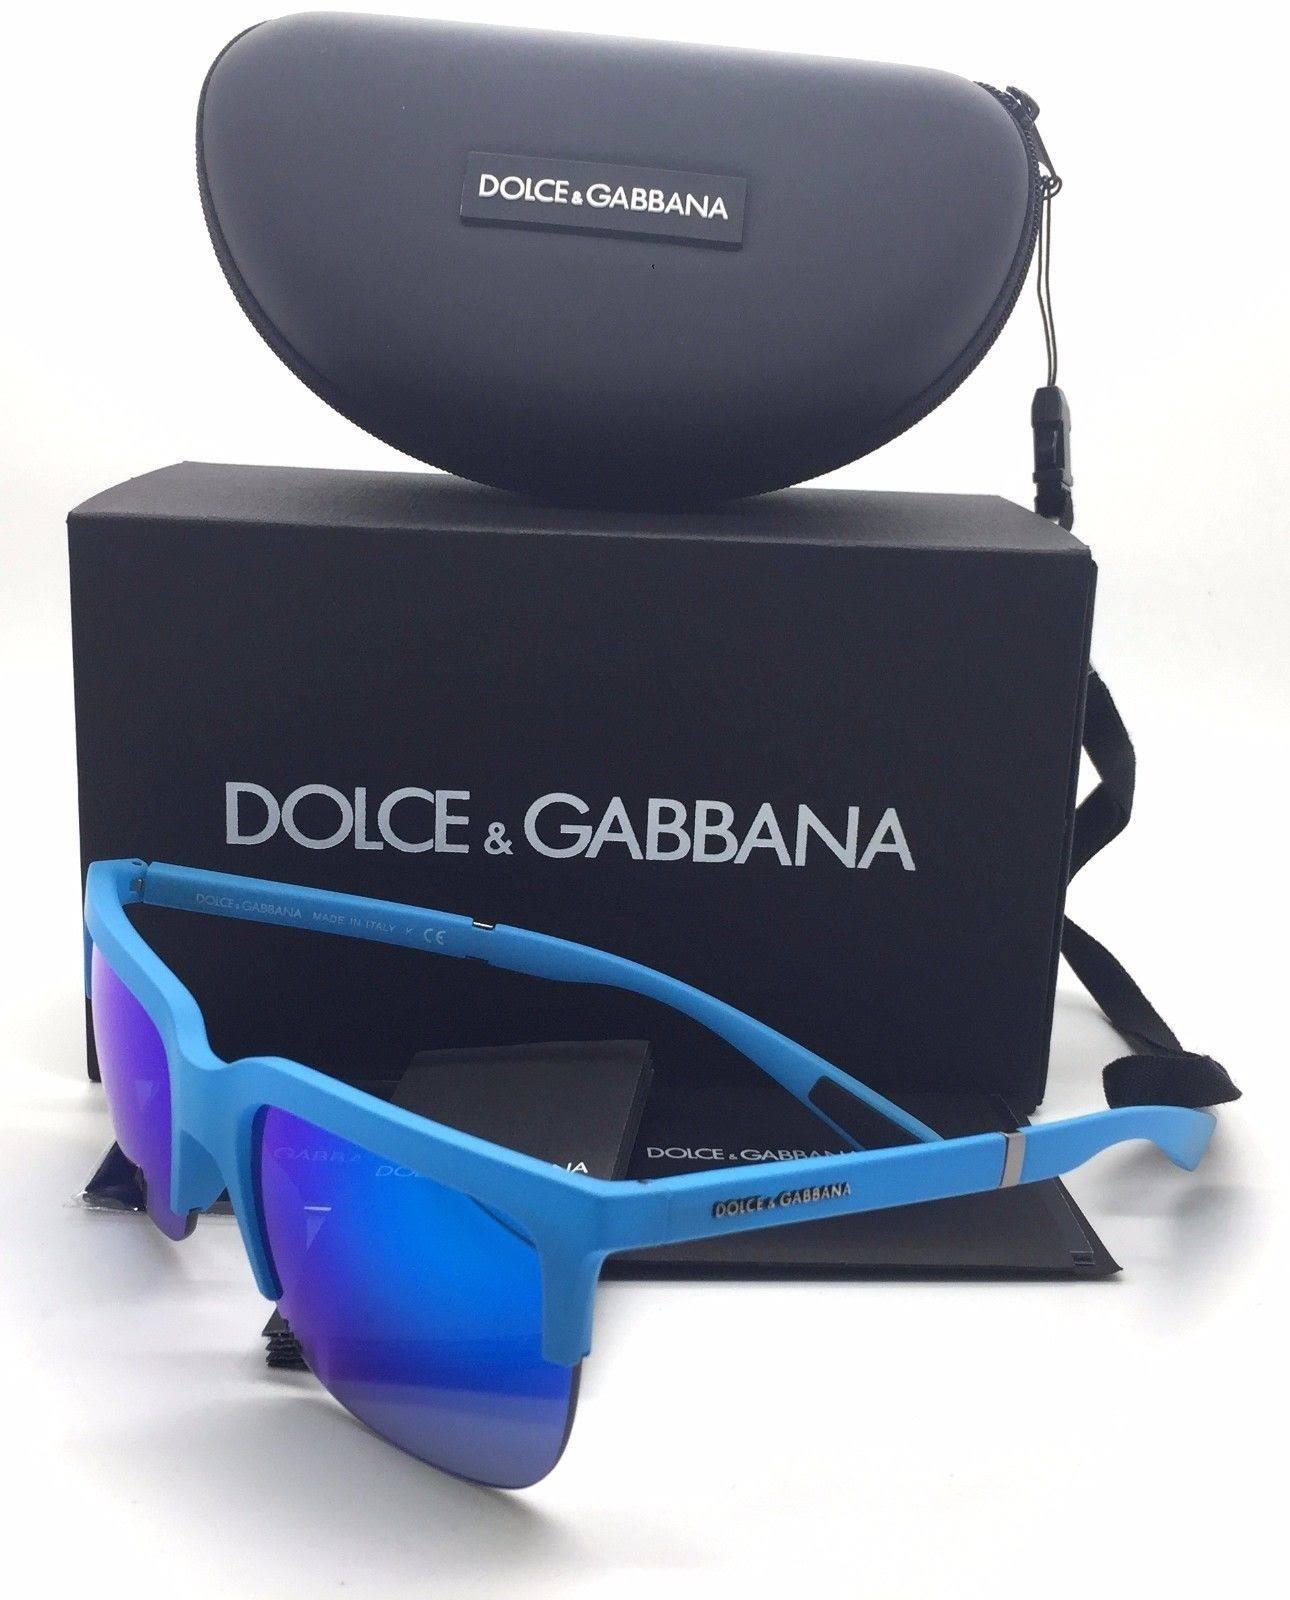 De 301525 Sol amp; 6097 Celeste Dolce Gabbana Gafas 6dzPw6